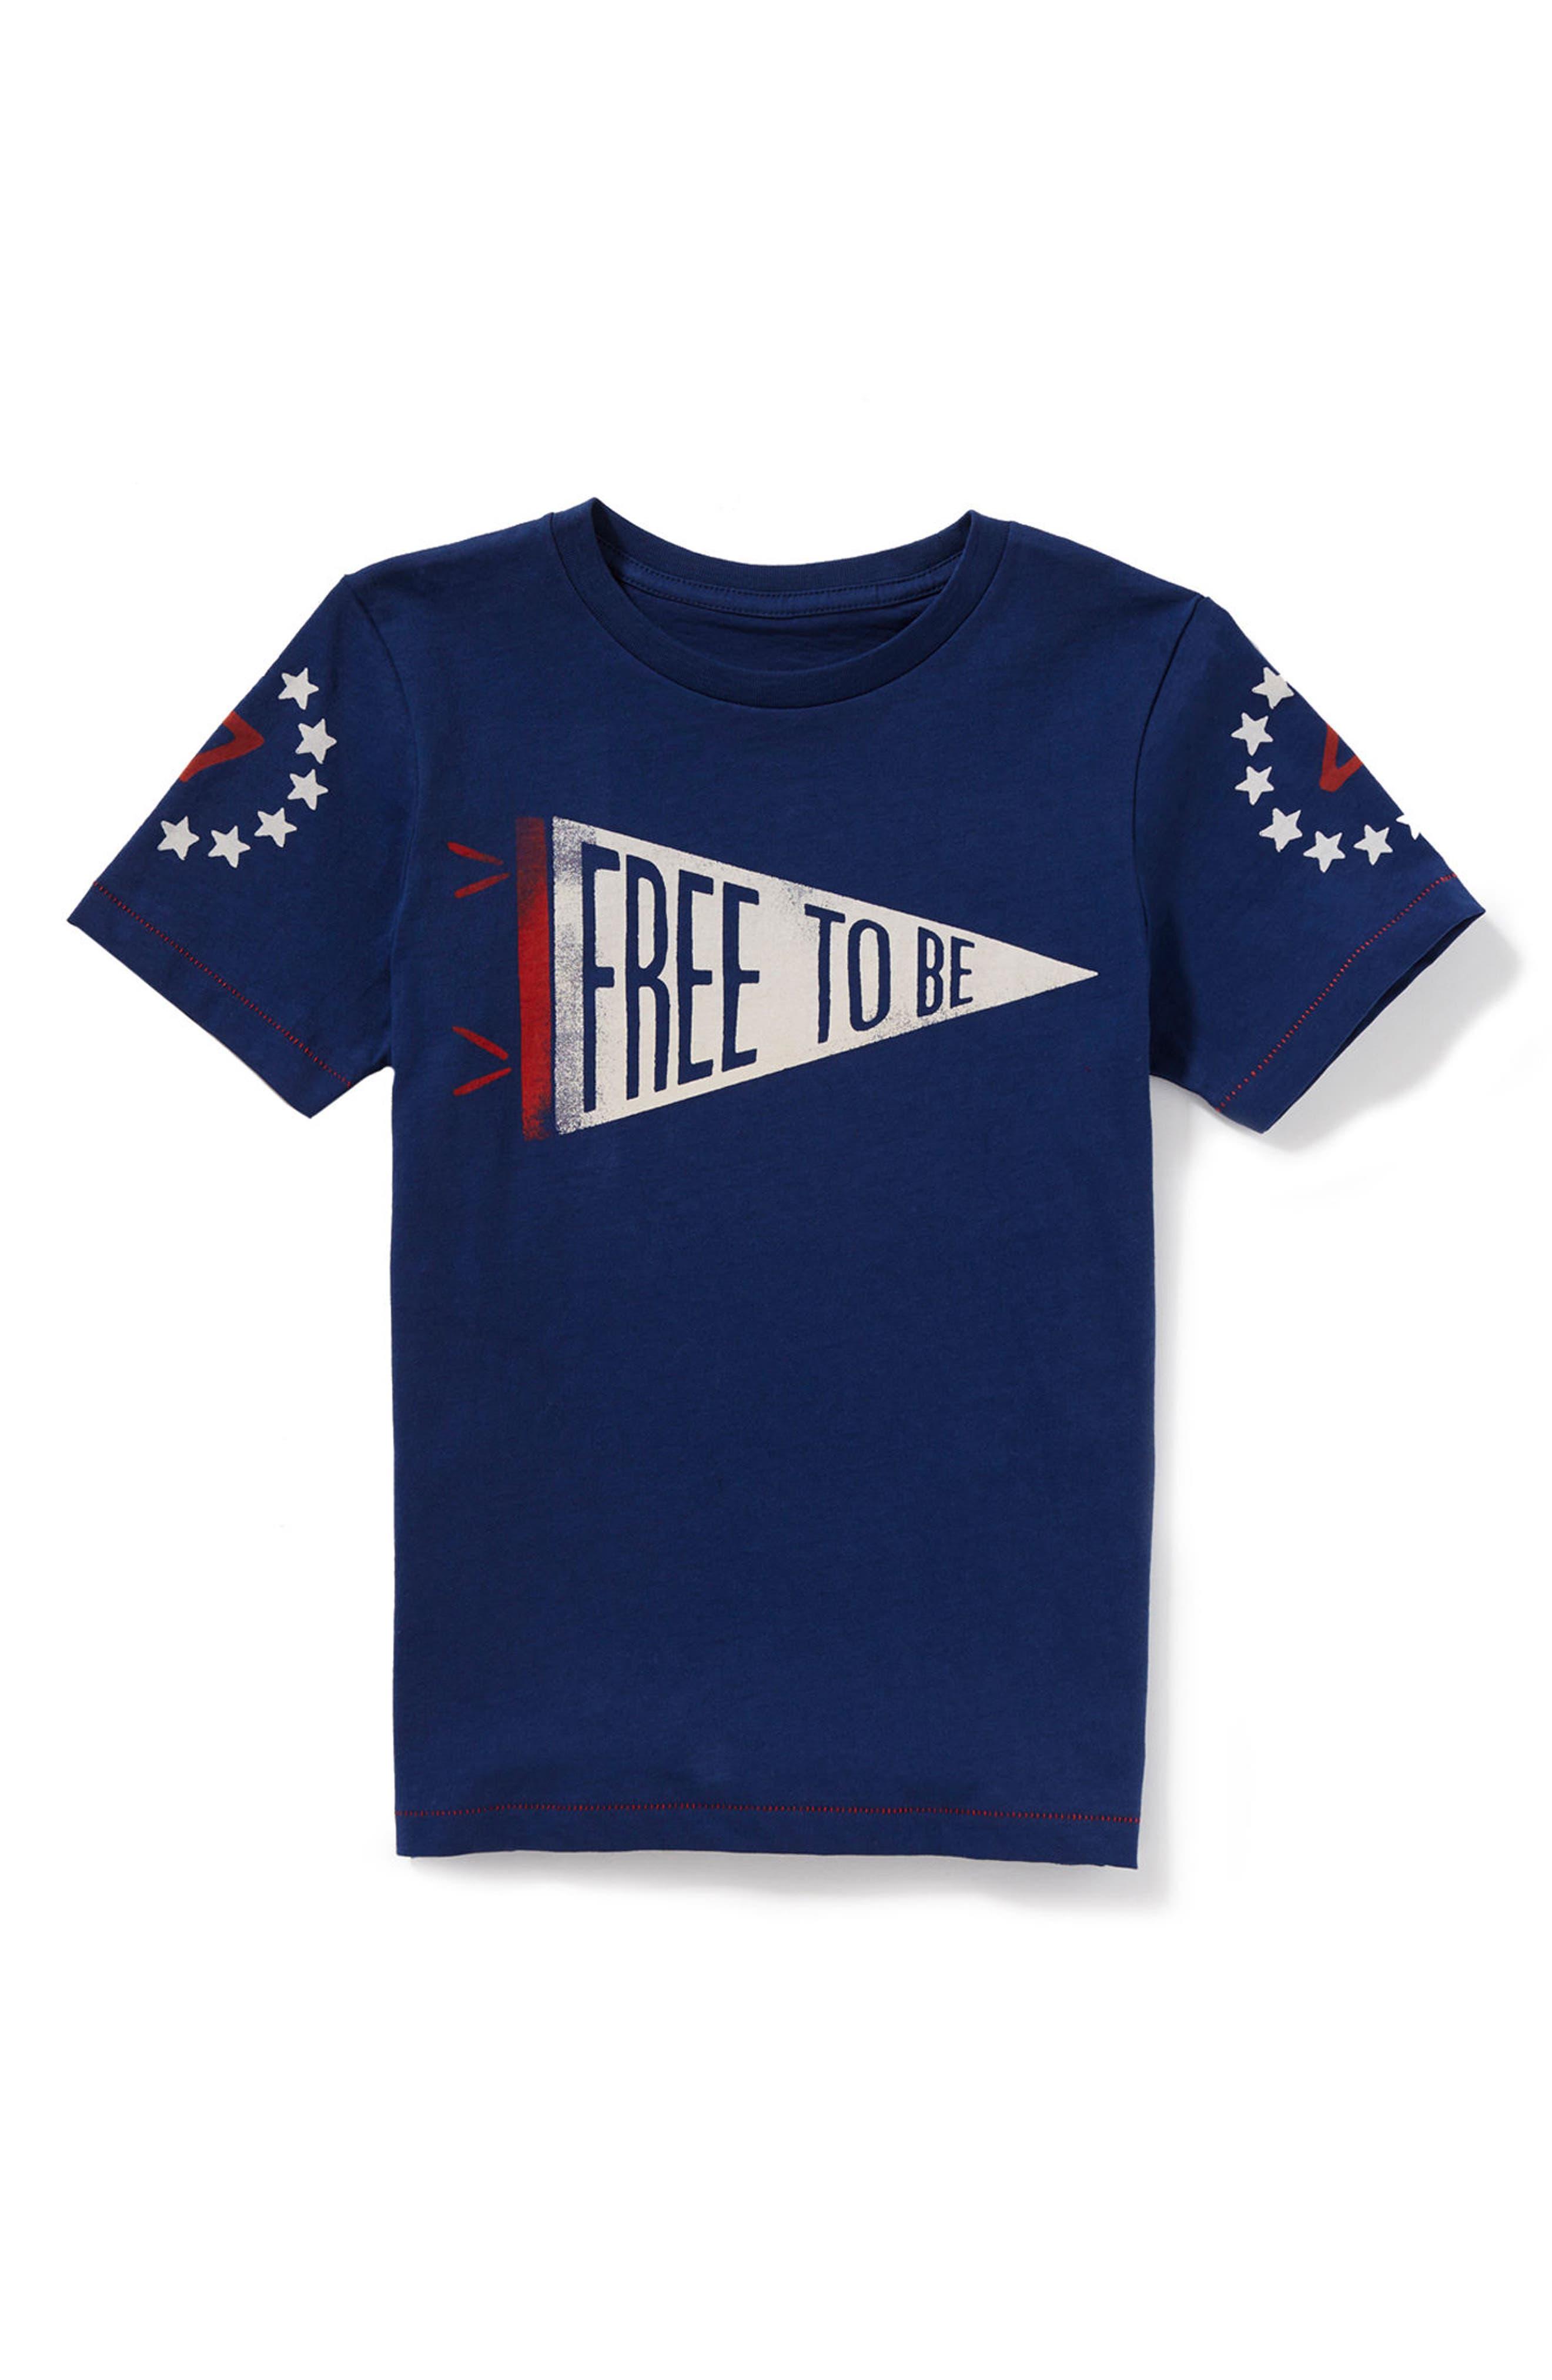 Peek Free to Be Graphic T-Shirt (Toddler Boys, Little Boys & Big Boys)